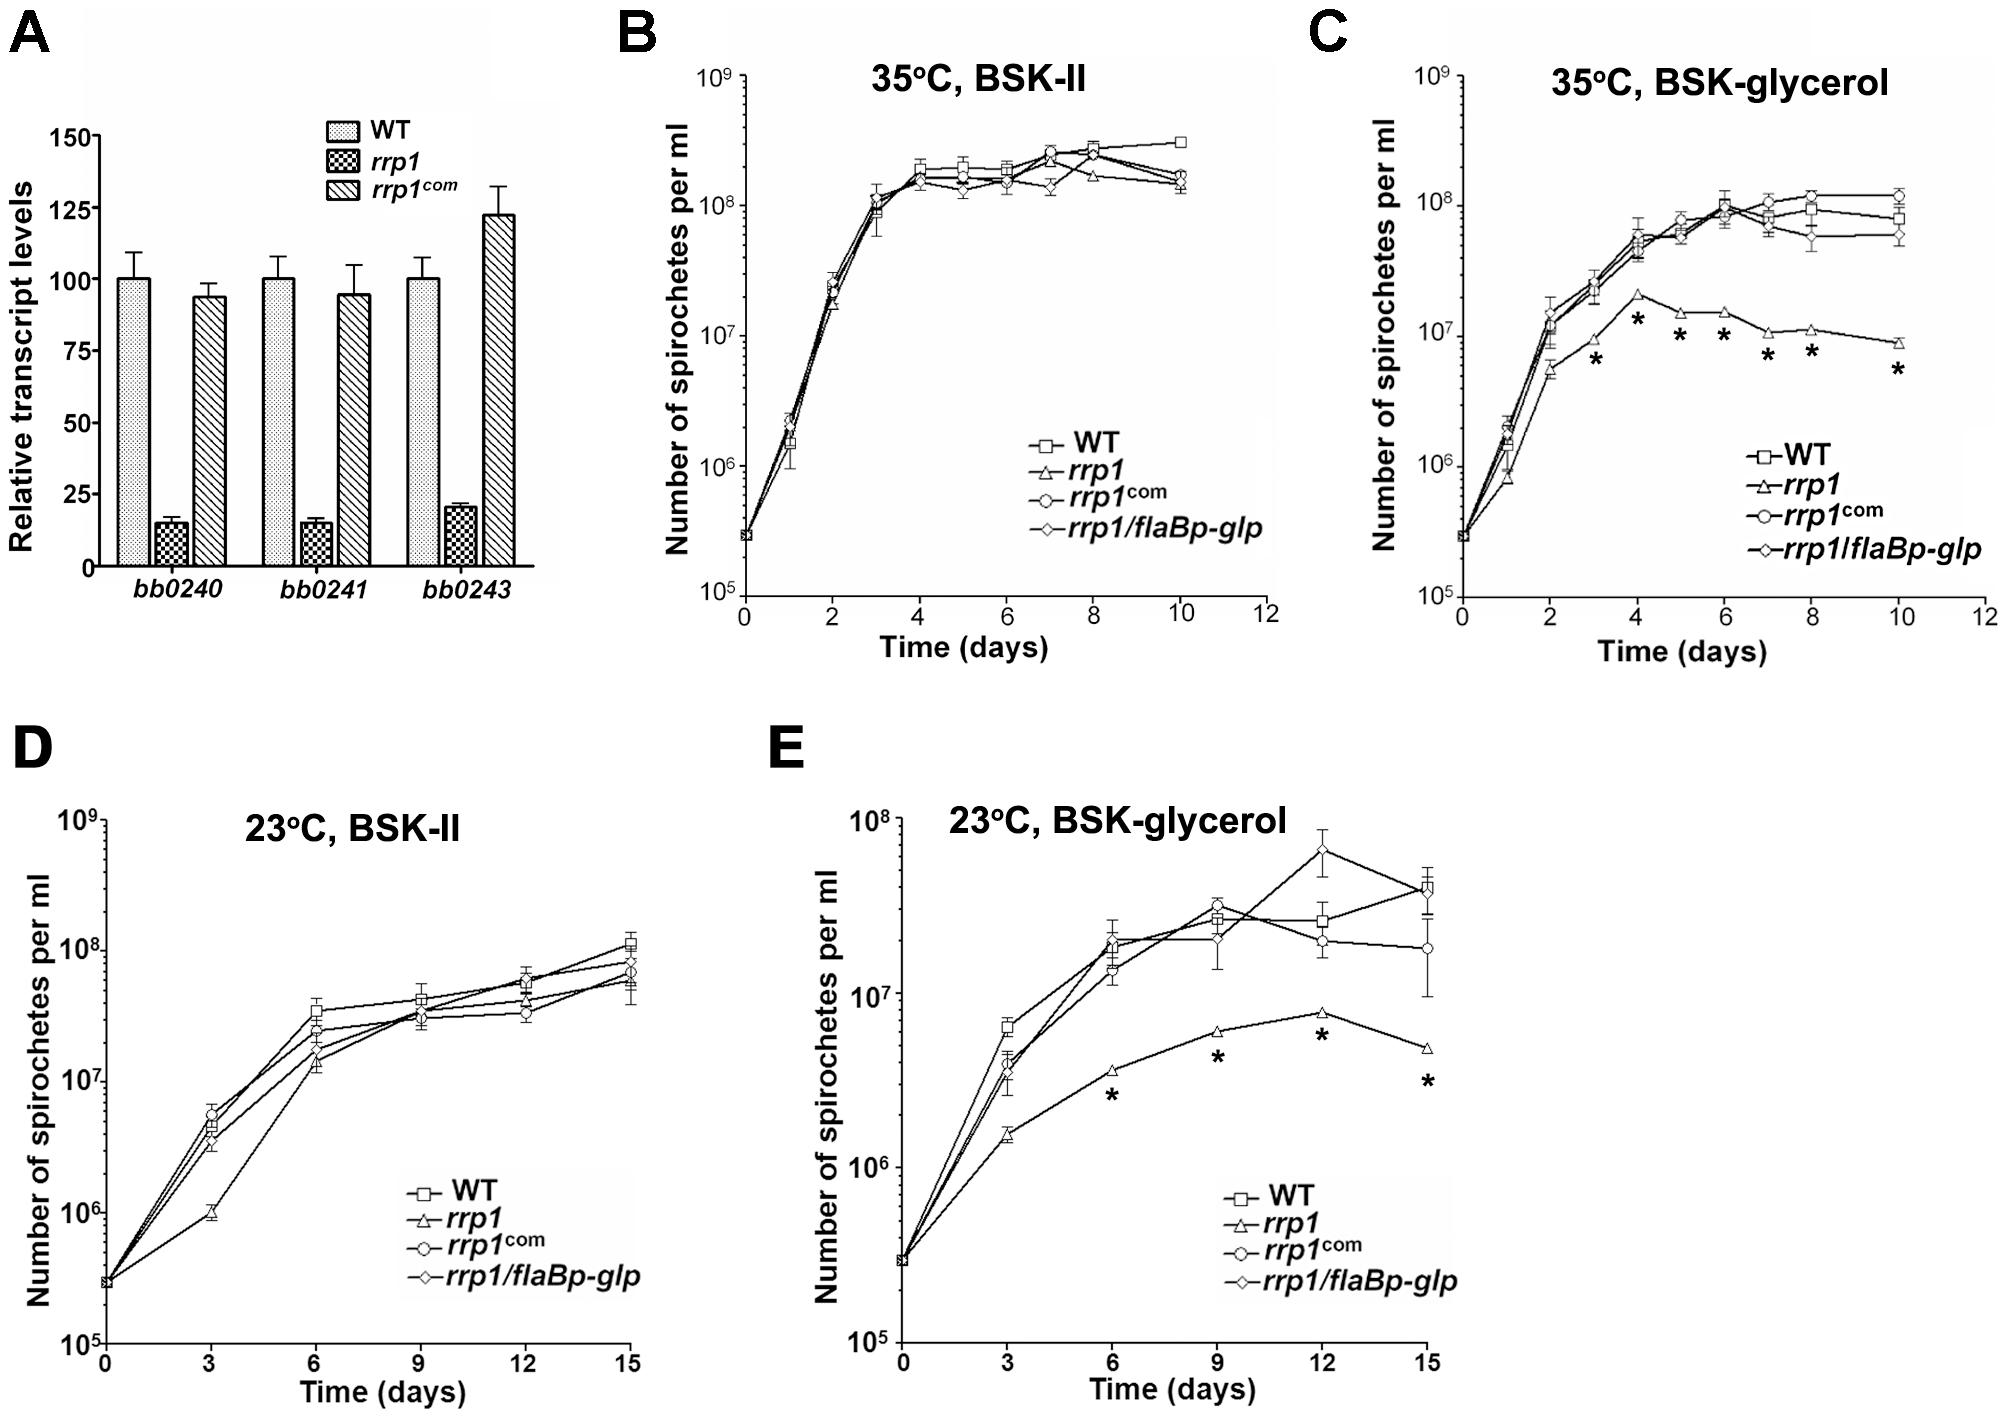 Rrp1 controls expression of the glycerol gene operon (<i>bb0240-0243)</i>.